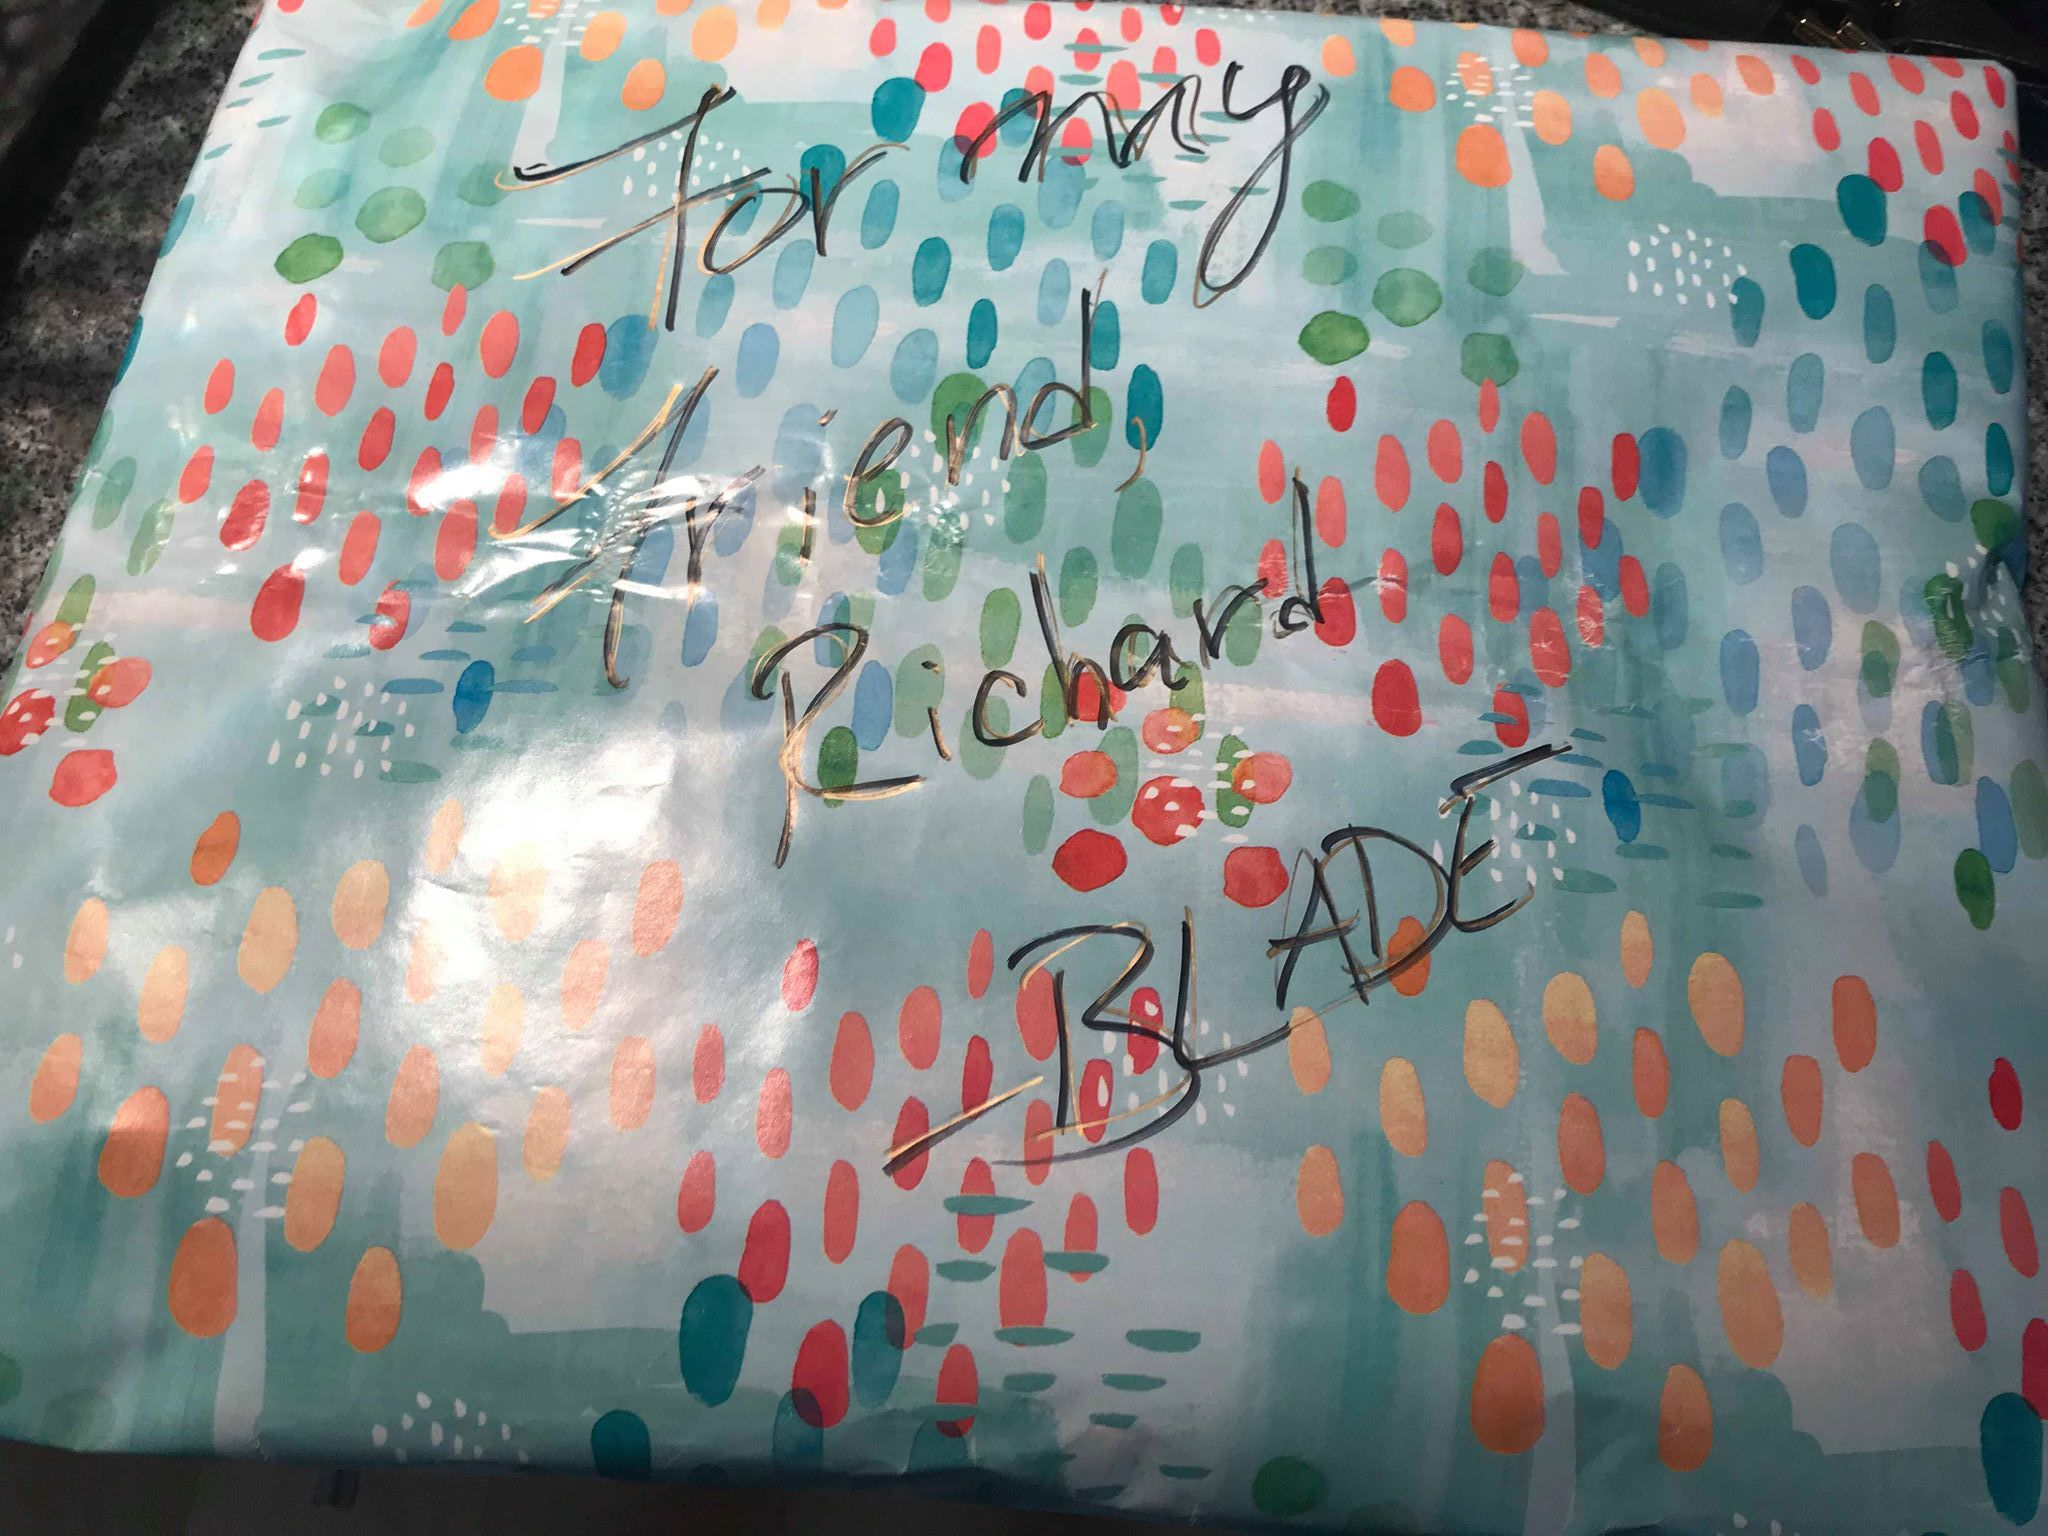 A surprise gift -Richard Seidlitz